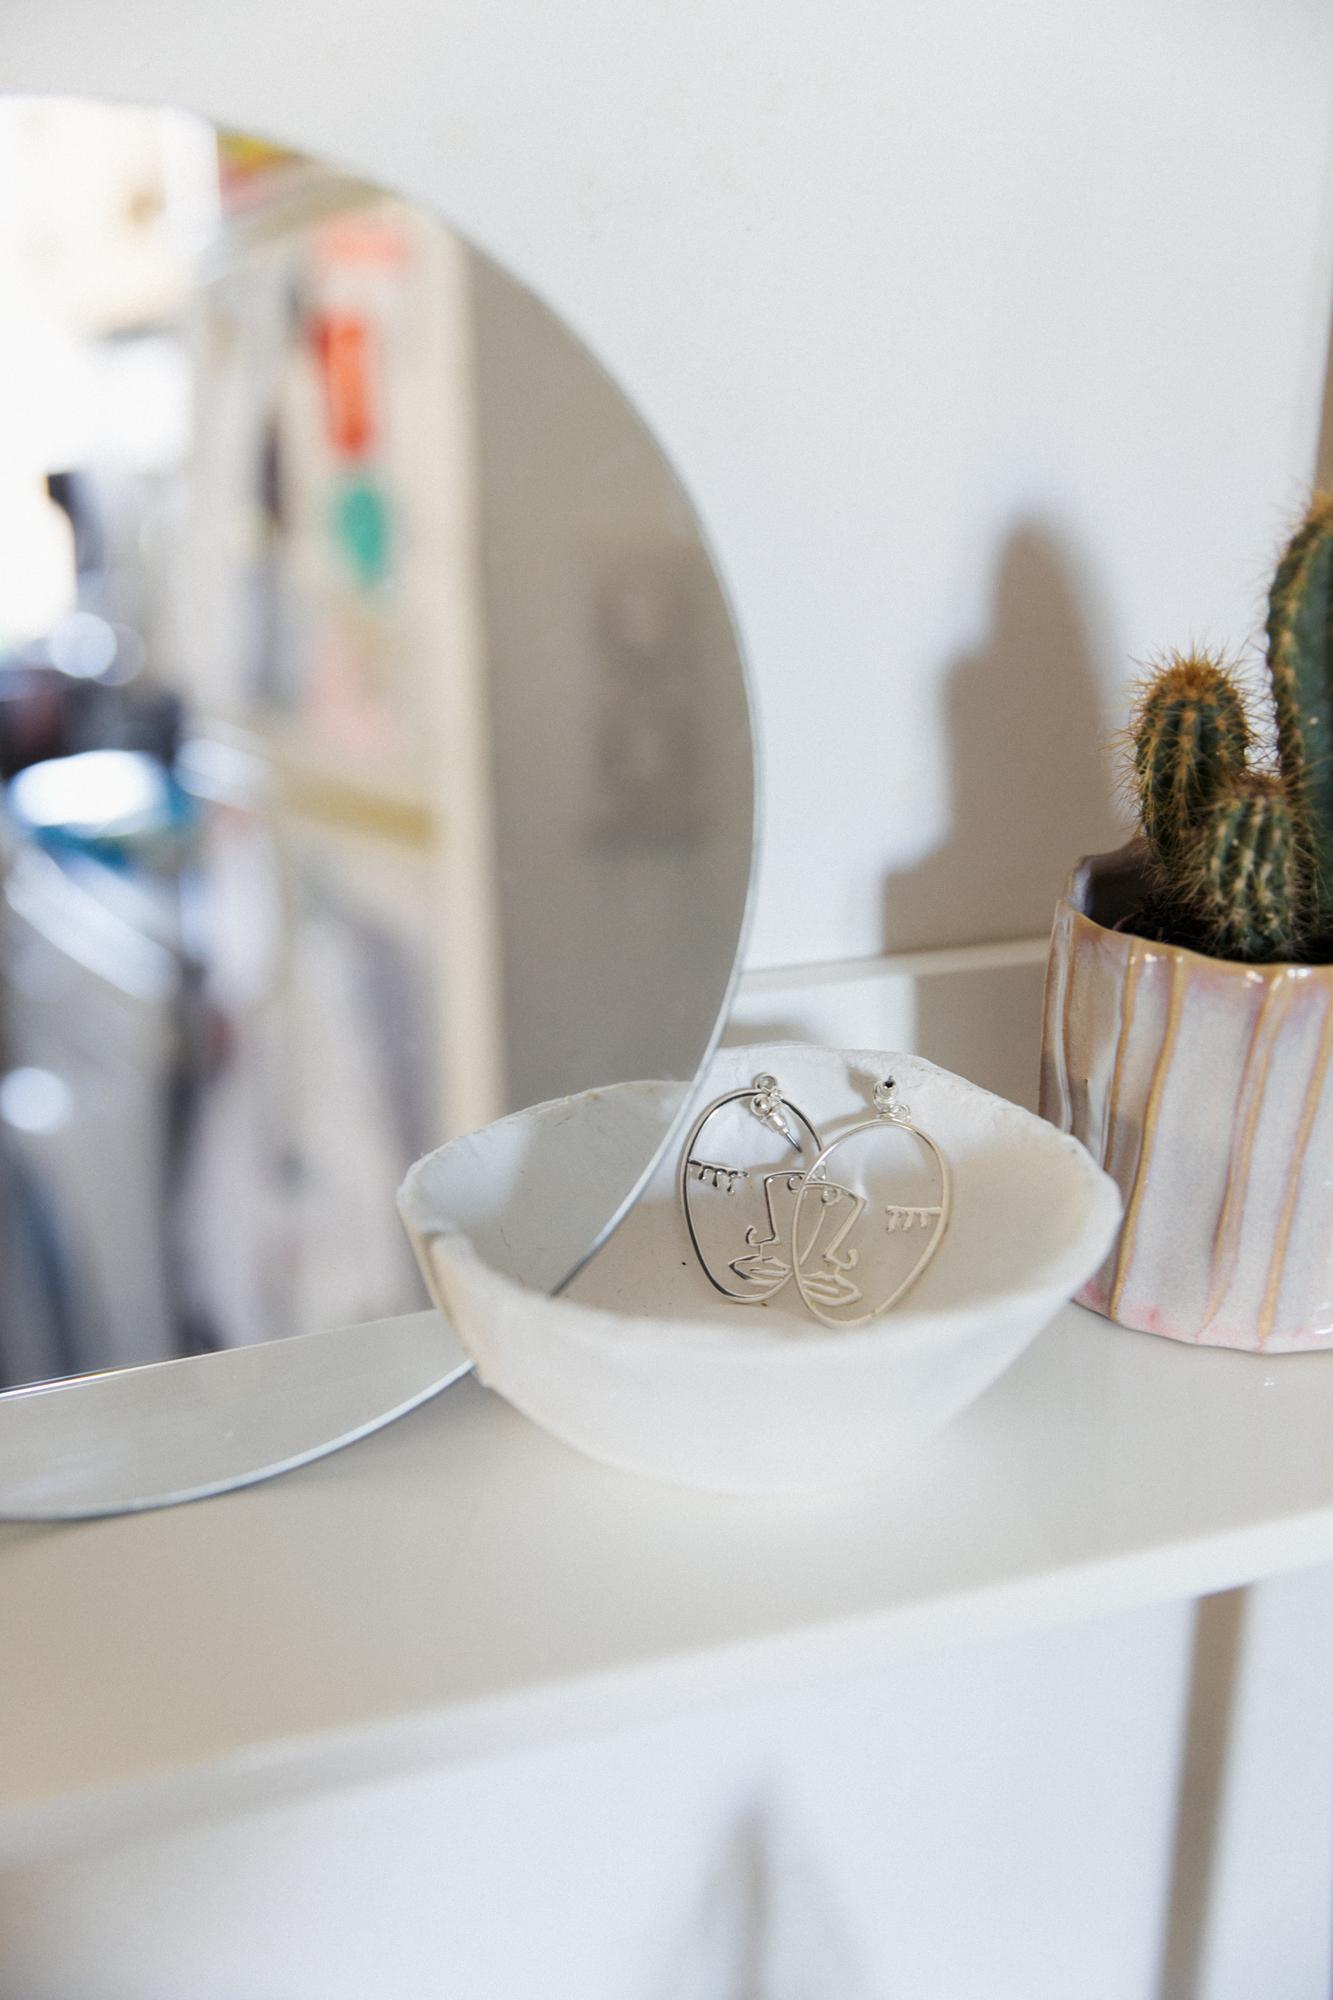 DIY miroir porte bijoux-mirror-jewelry-holder-11